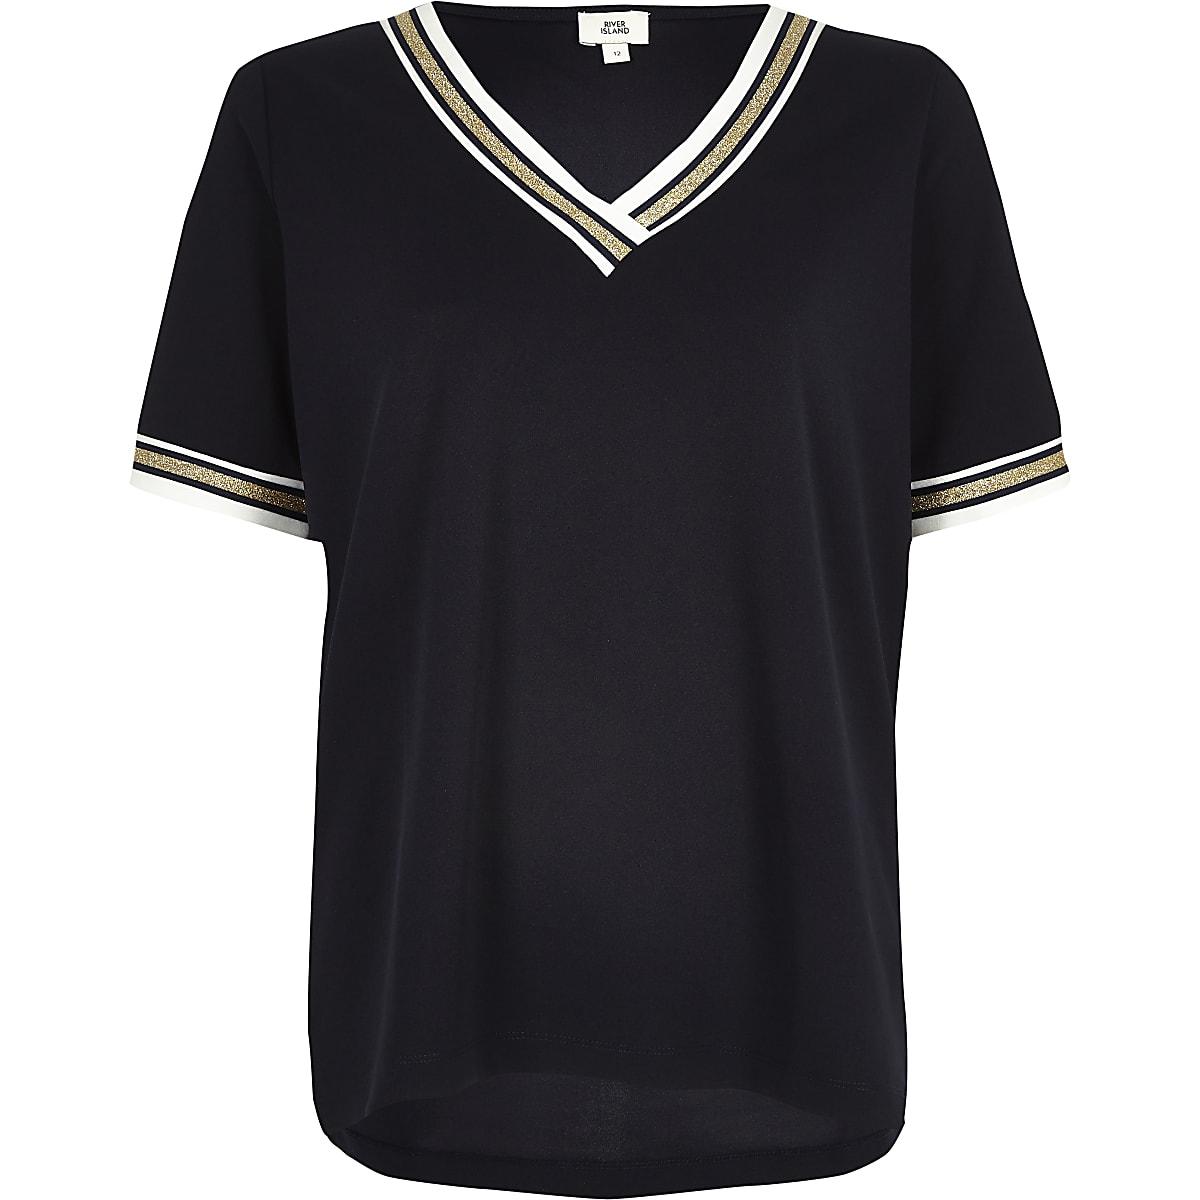 693e01bb Navy tipped v neck loose fit T-shirt - T-Shirts - Tops - women